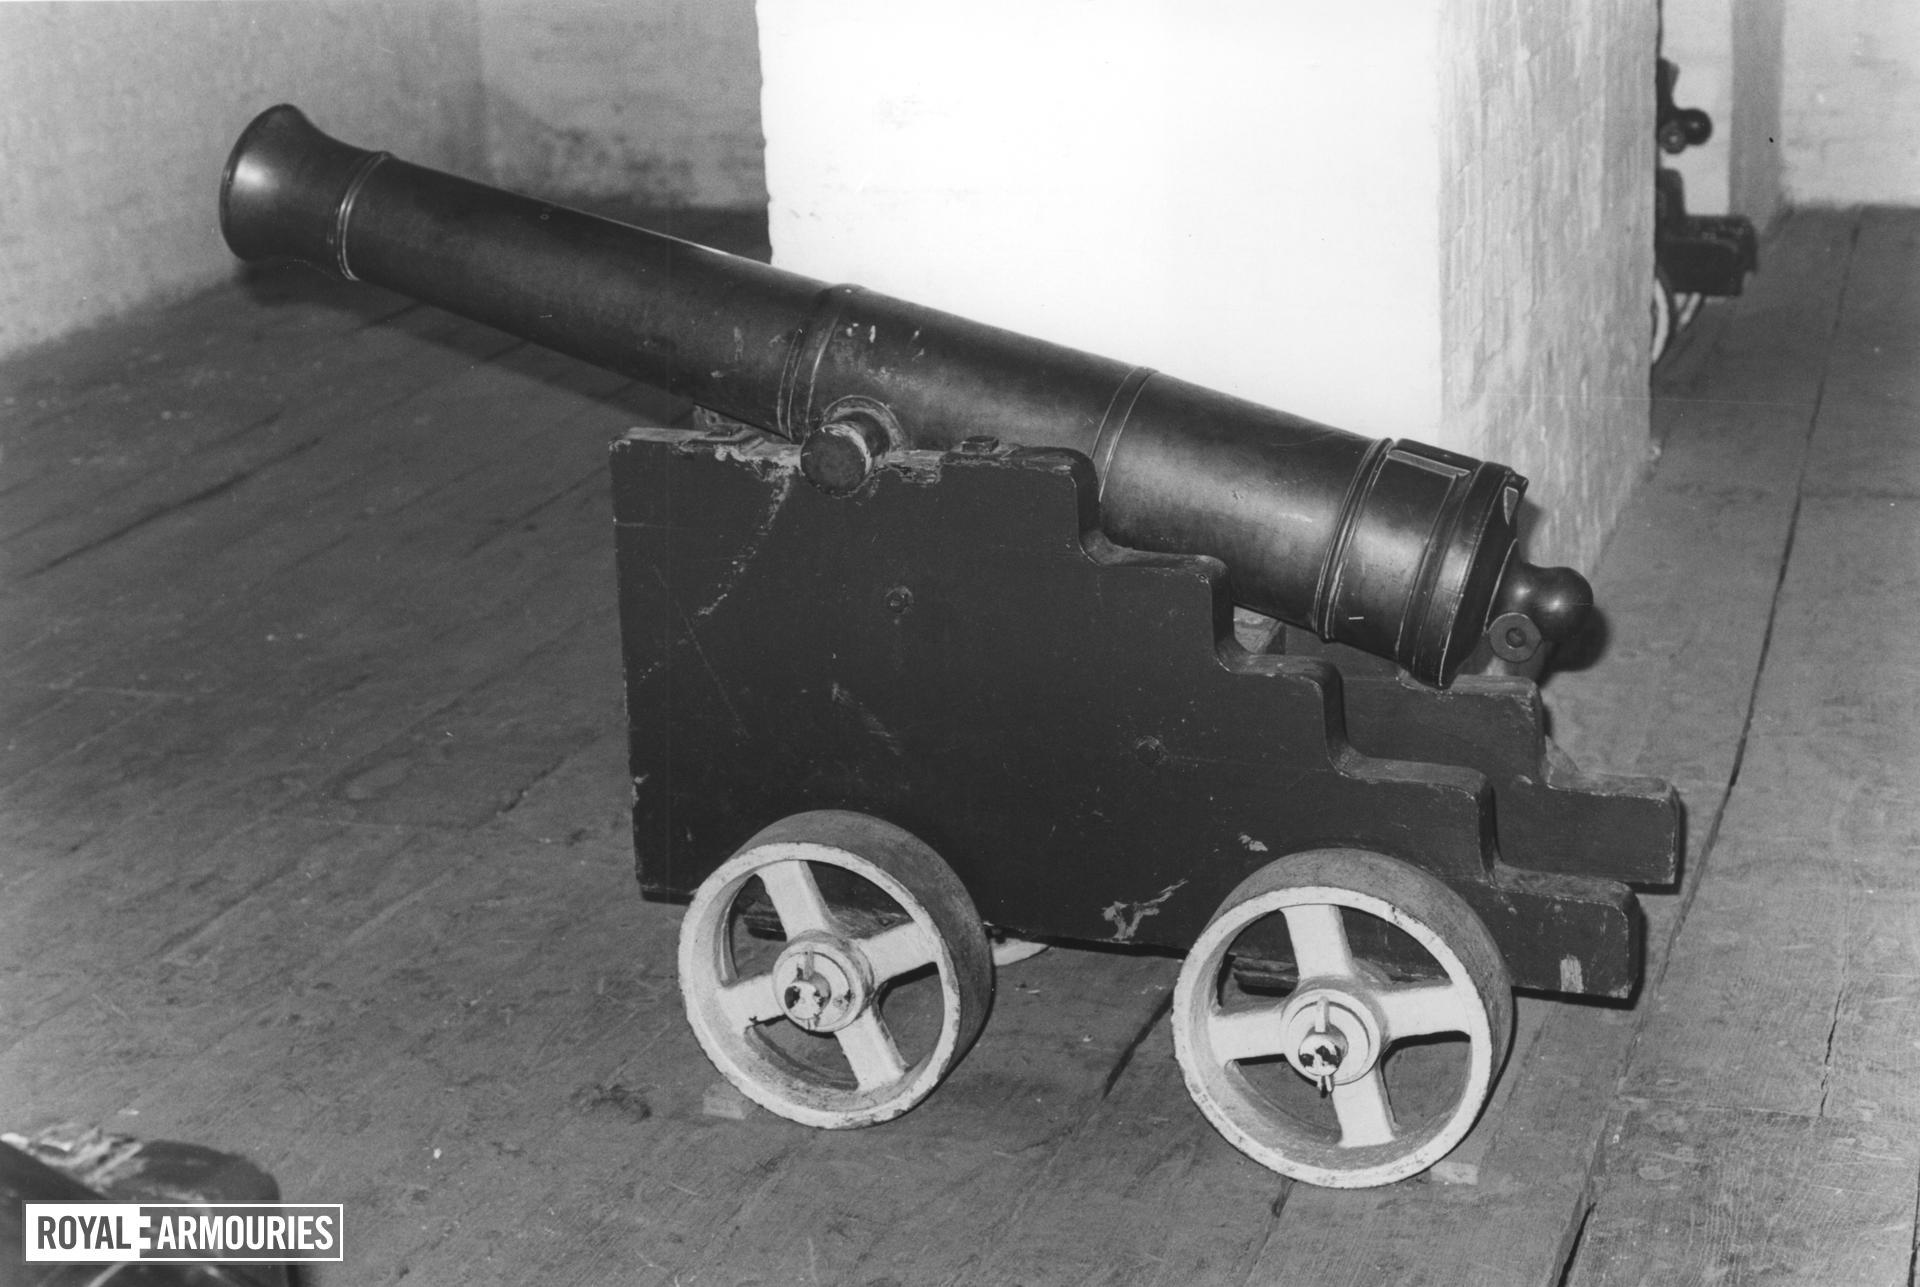 9 pr gun Smoothbore made of bronze